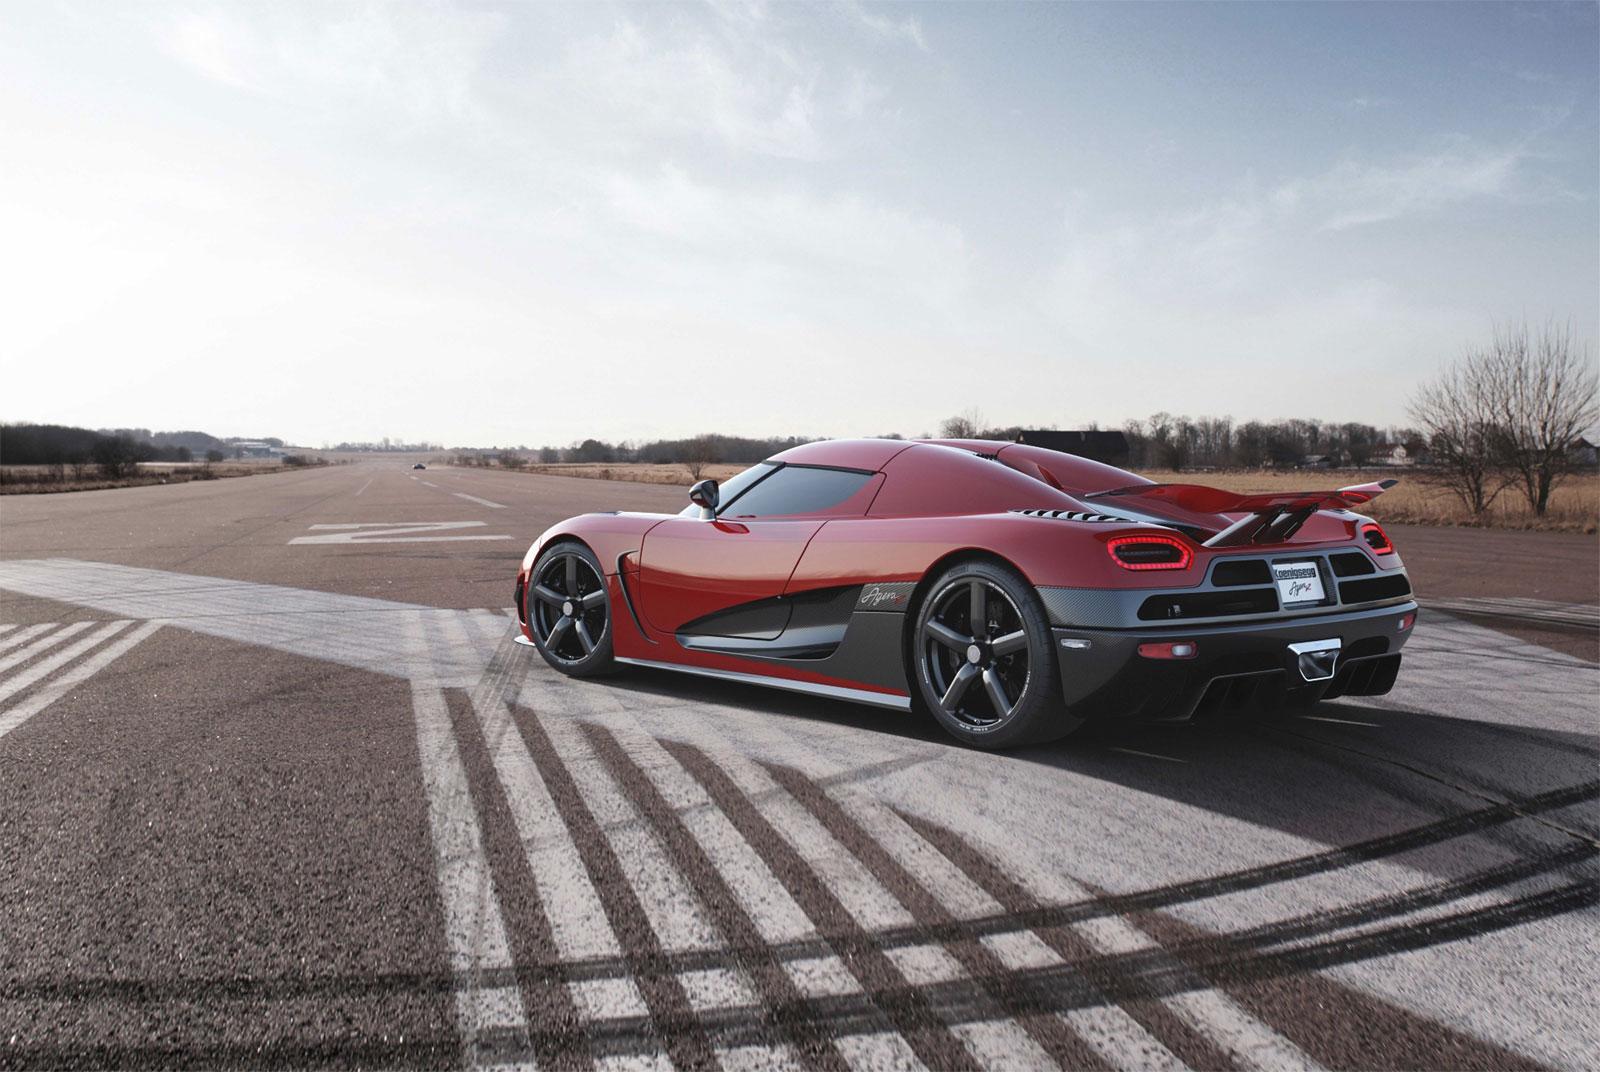 Sport Cars Koenigsegg Agera R hd Wallpapers 2013 1600x1072